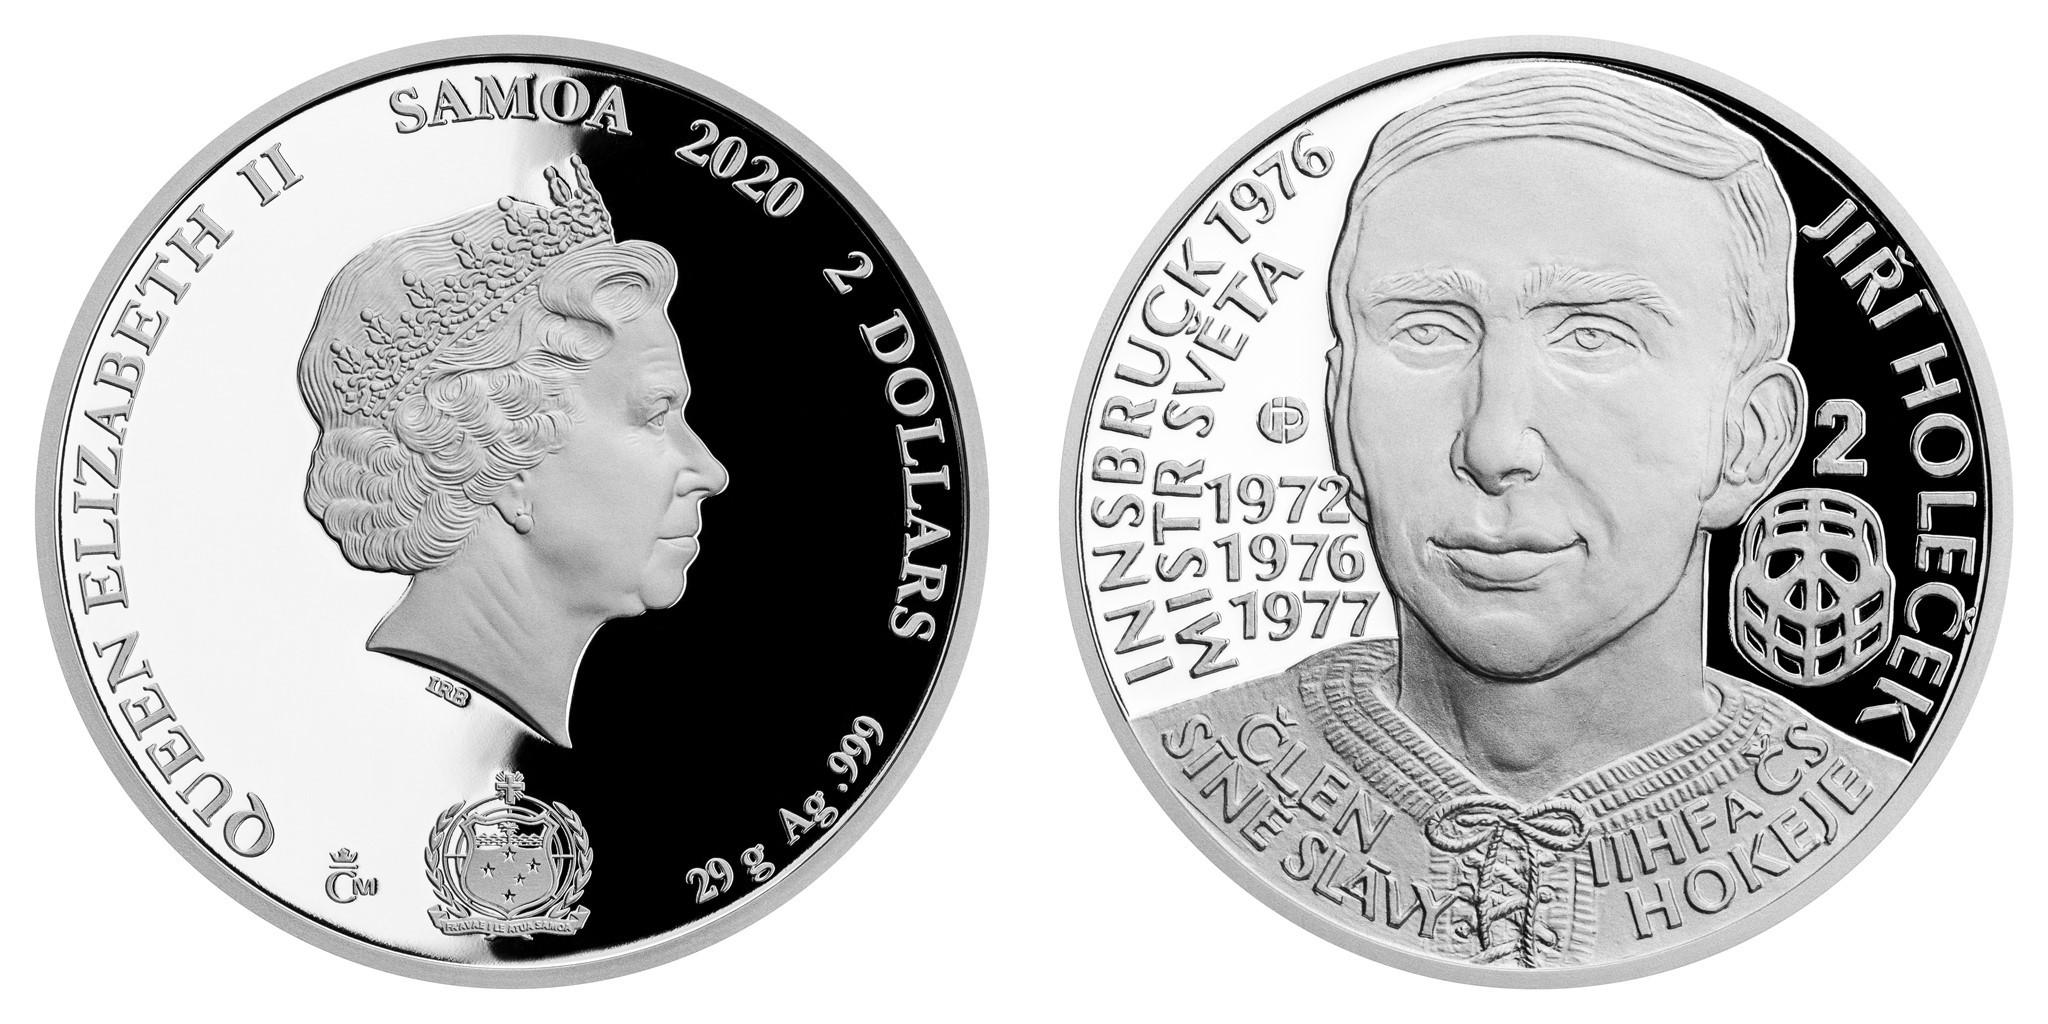 samoa-2020-jiri-holecek